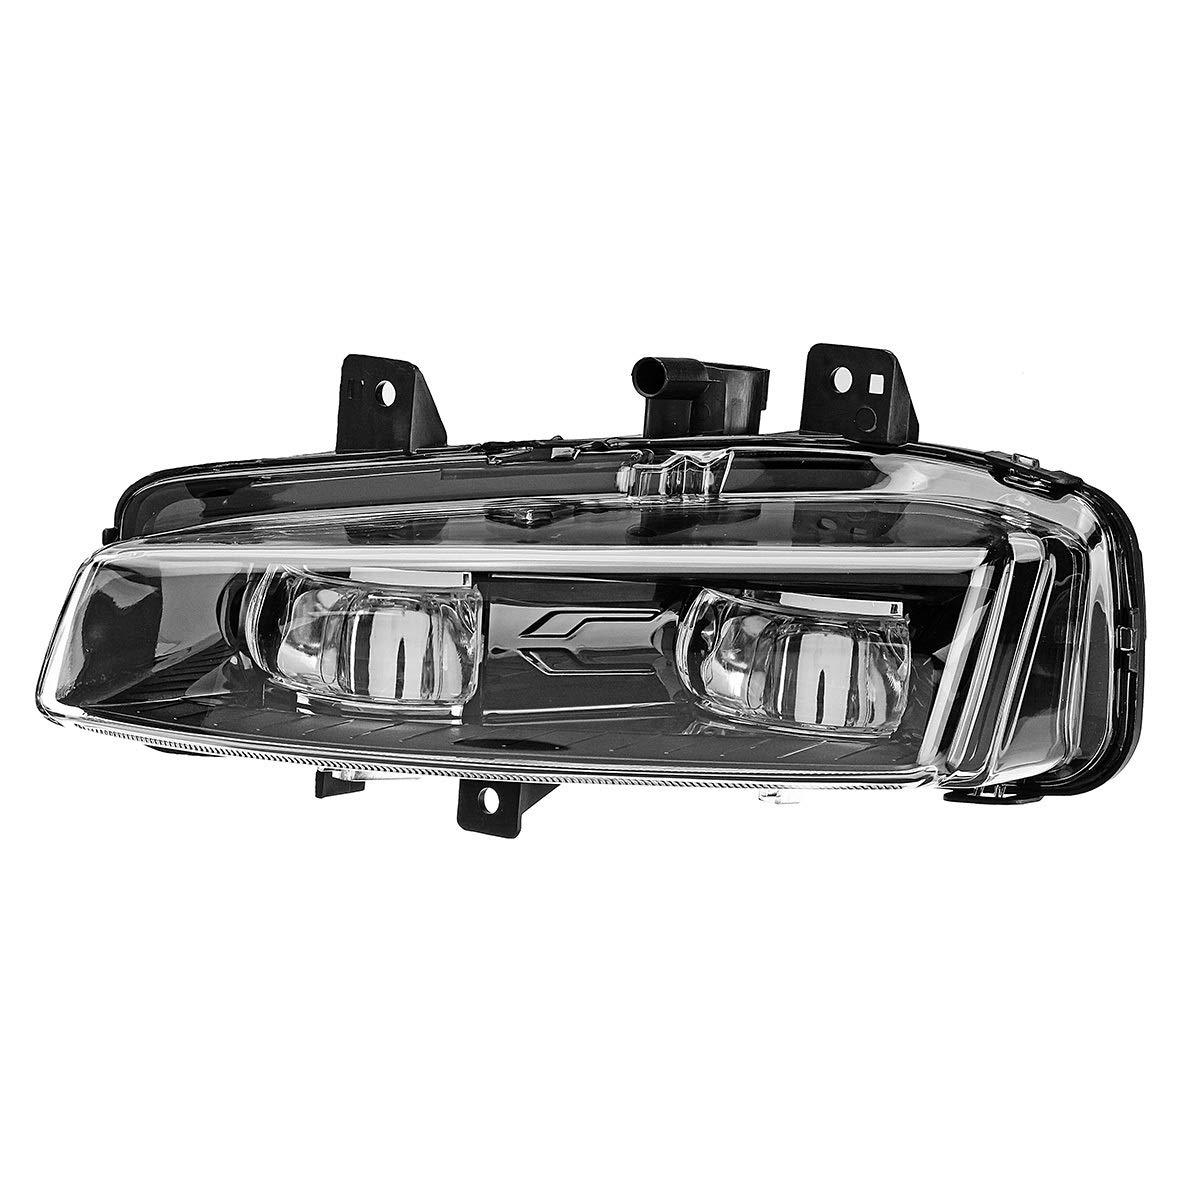 Color : Right WCHAOEN Car LED Front Bumper Fog Lights White Lamp for Range Rover Evoque Dynamic 2011-2016 New car light